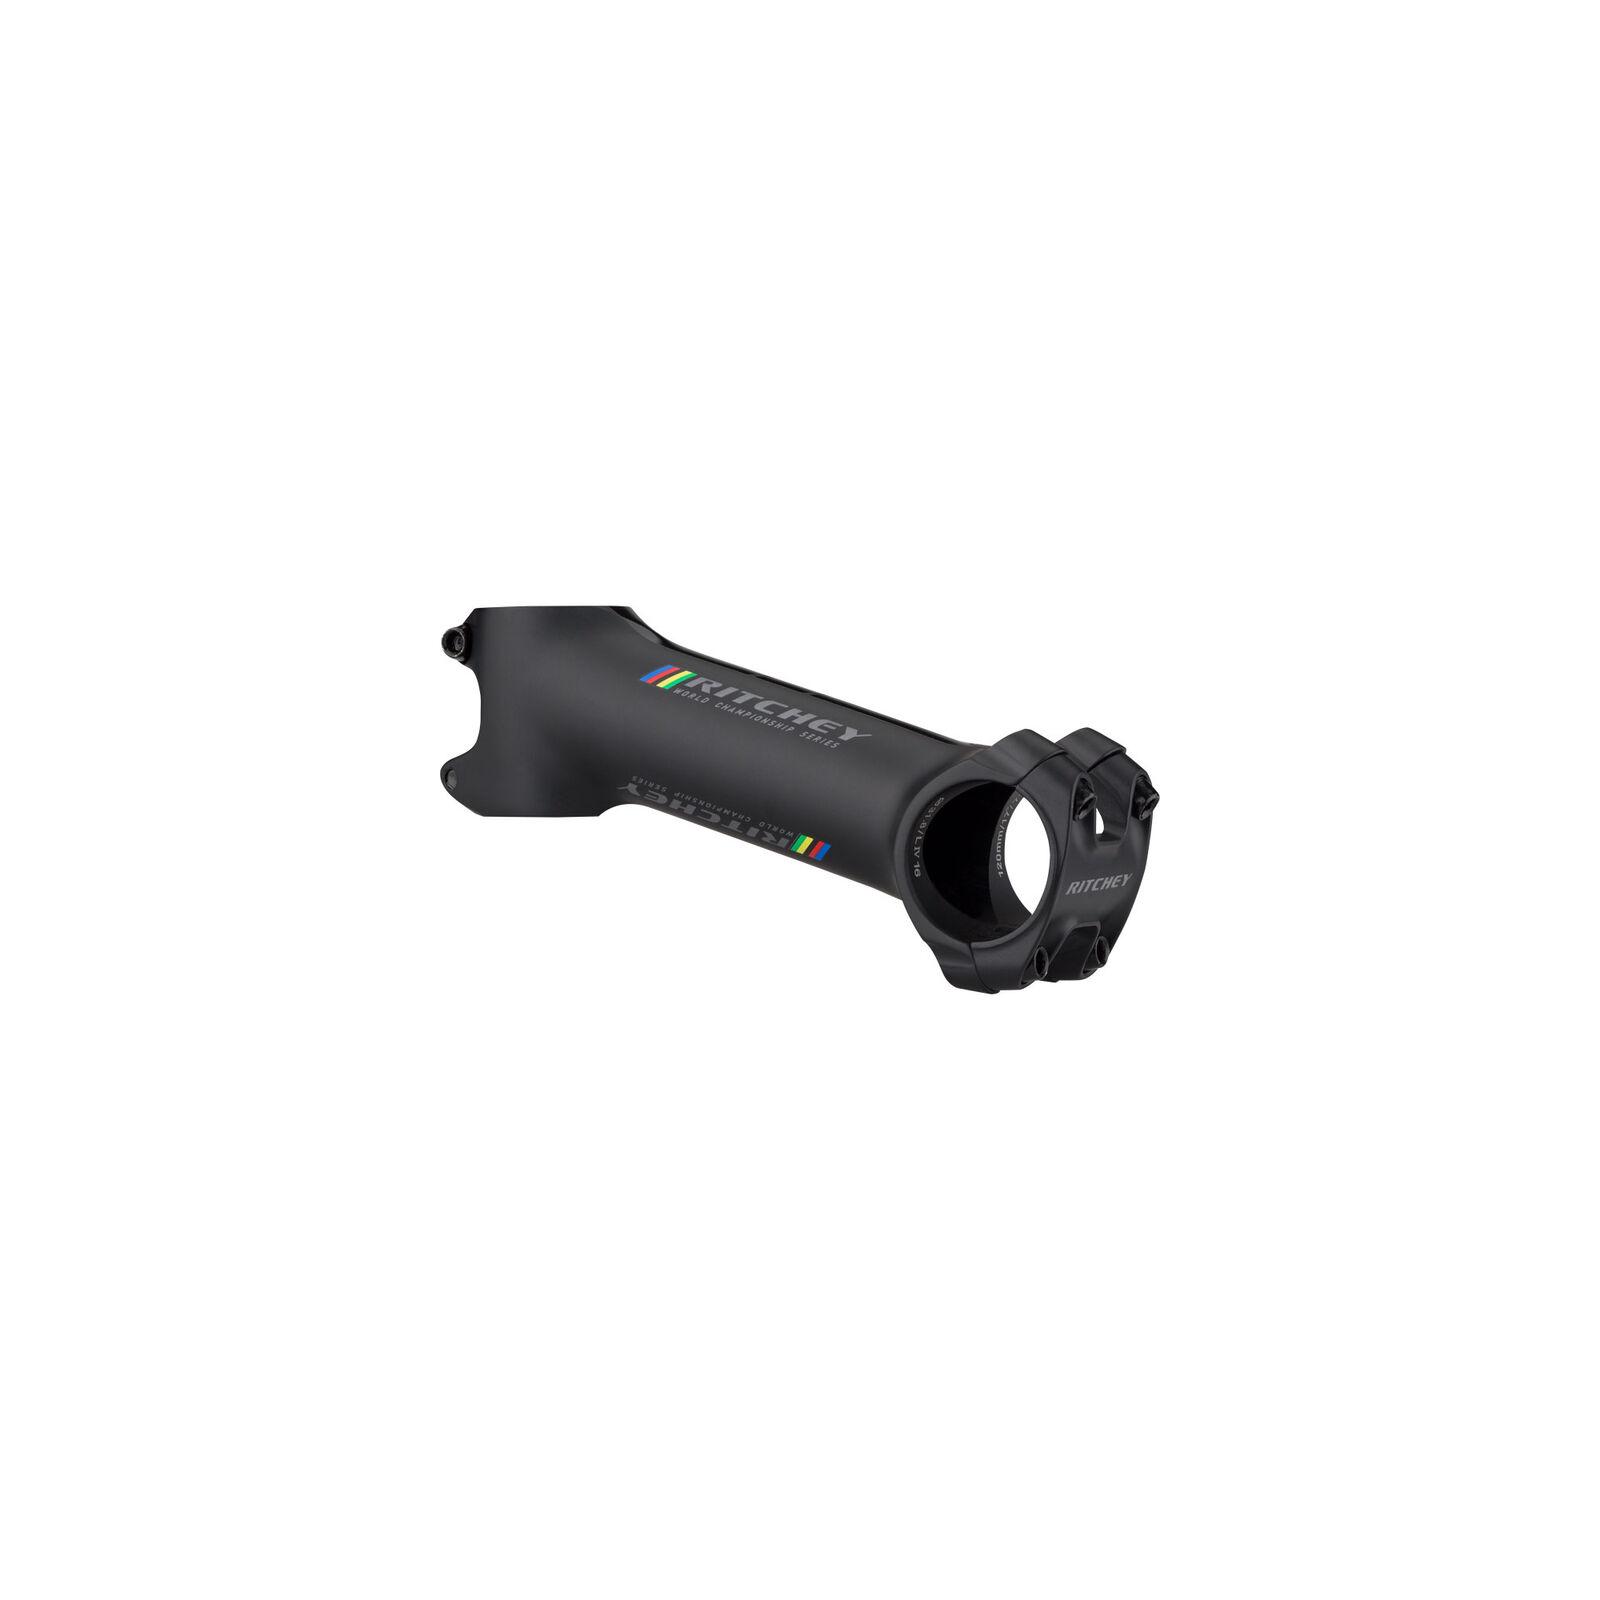 Ritchey WCS C220 73D Stem  120mm, + - 17, 31.8, 1-1 8, Blatte